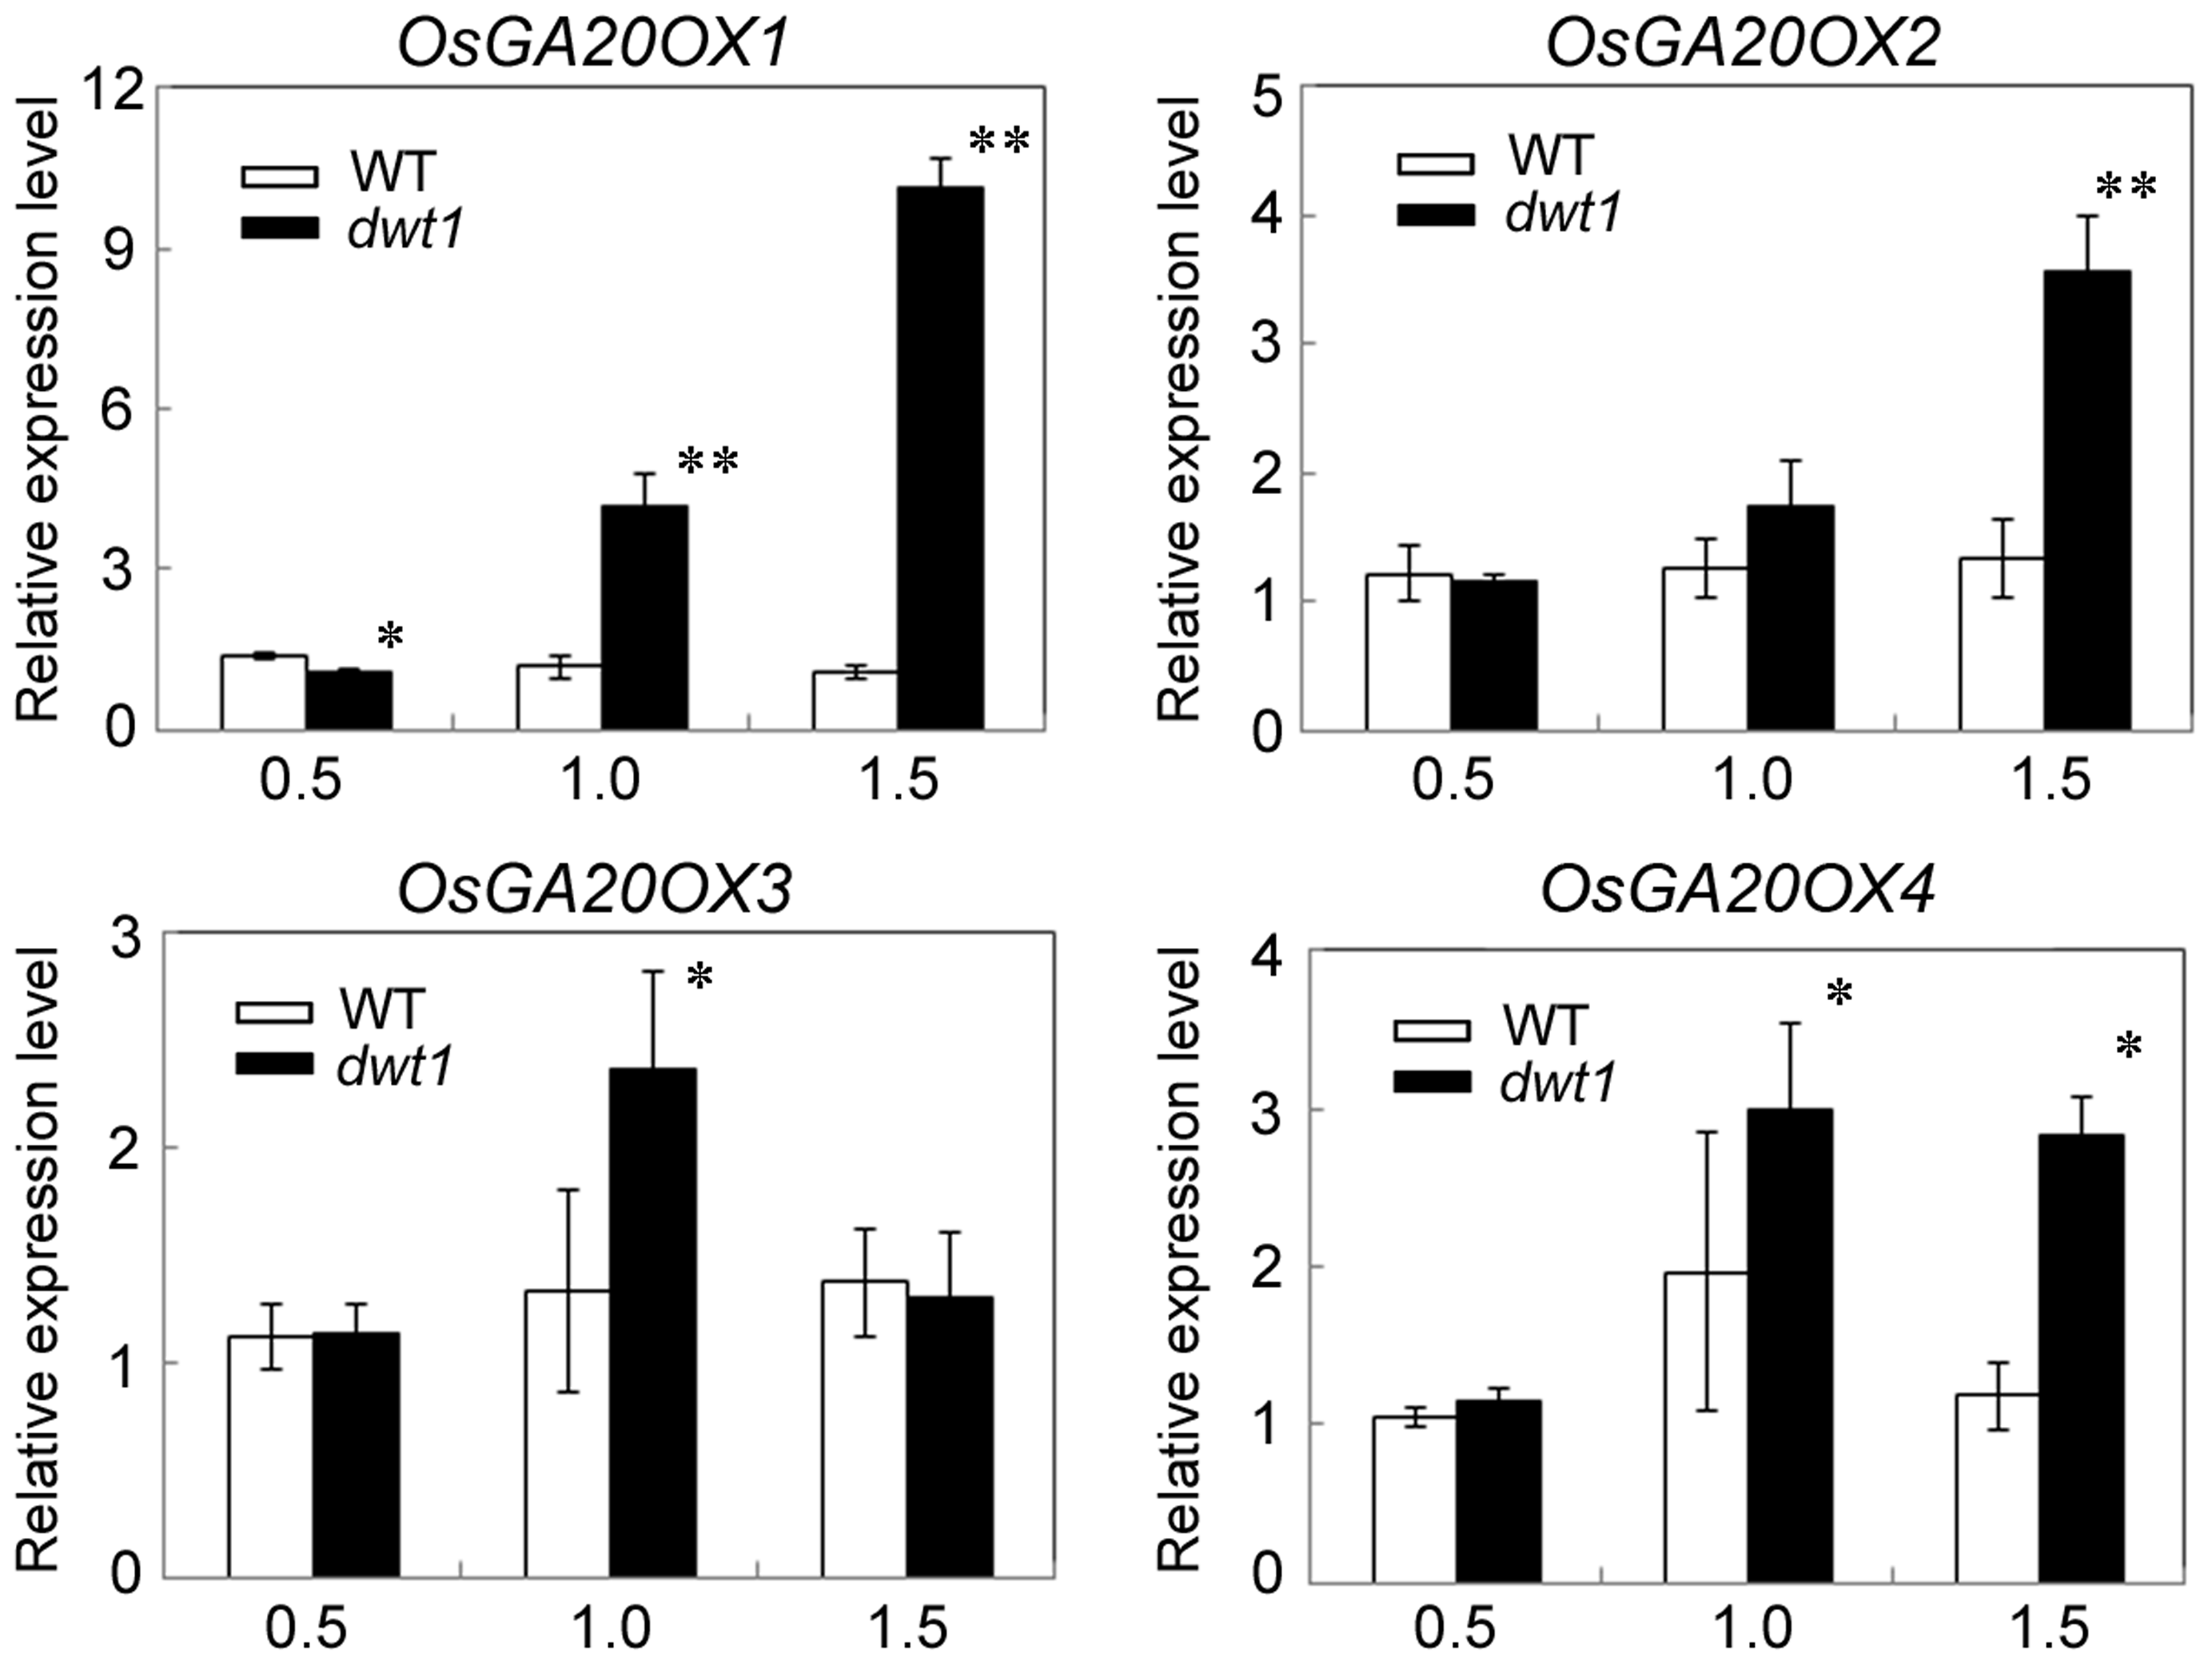 <i>OsGA20OX</i> genes have increased expression in <i>dwt1</i>.